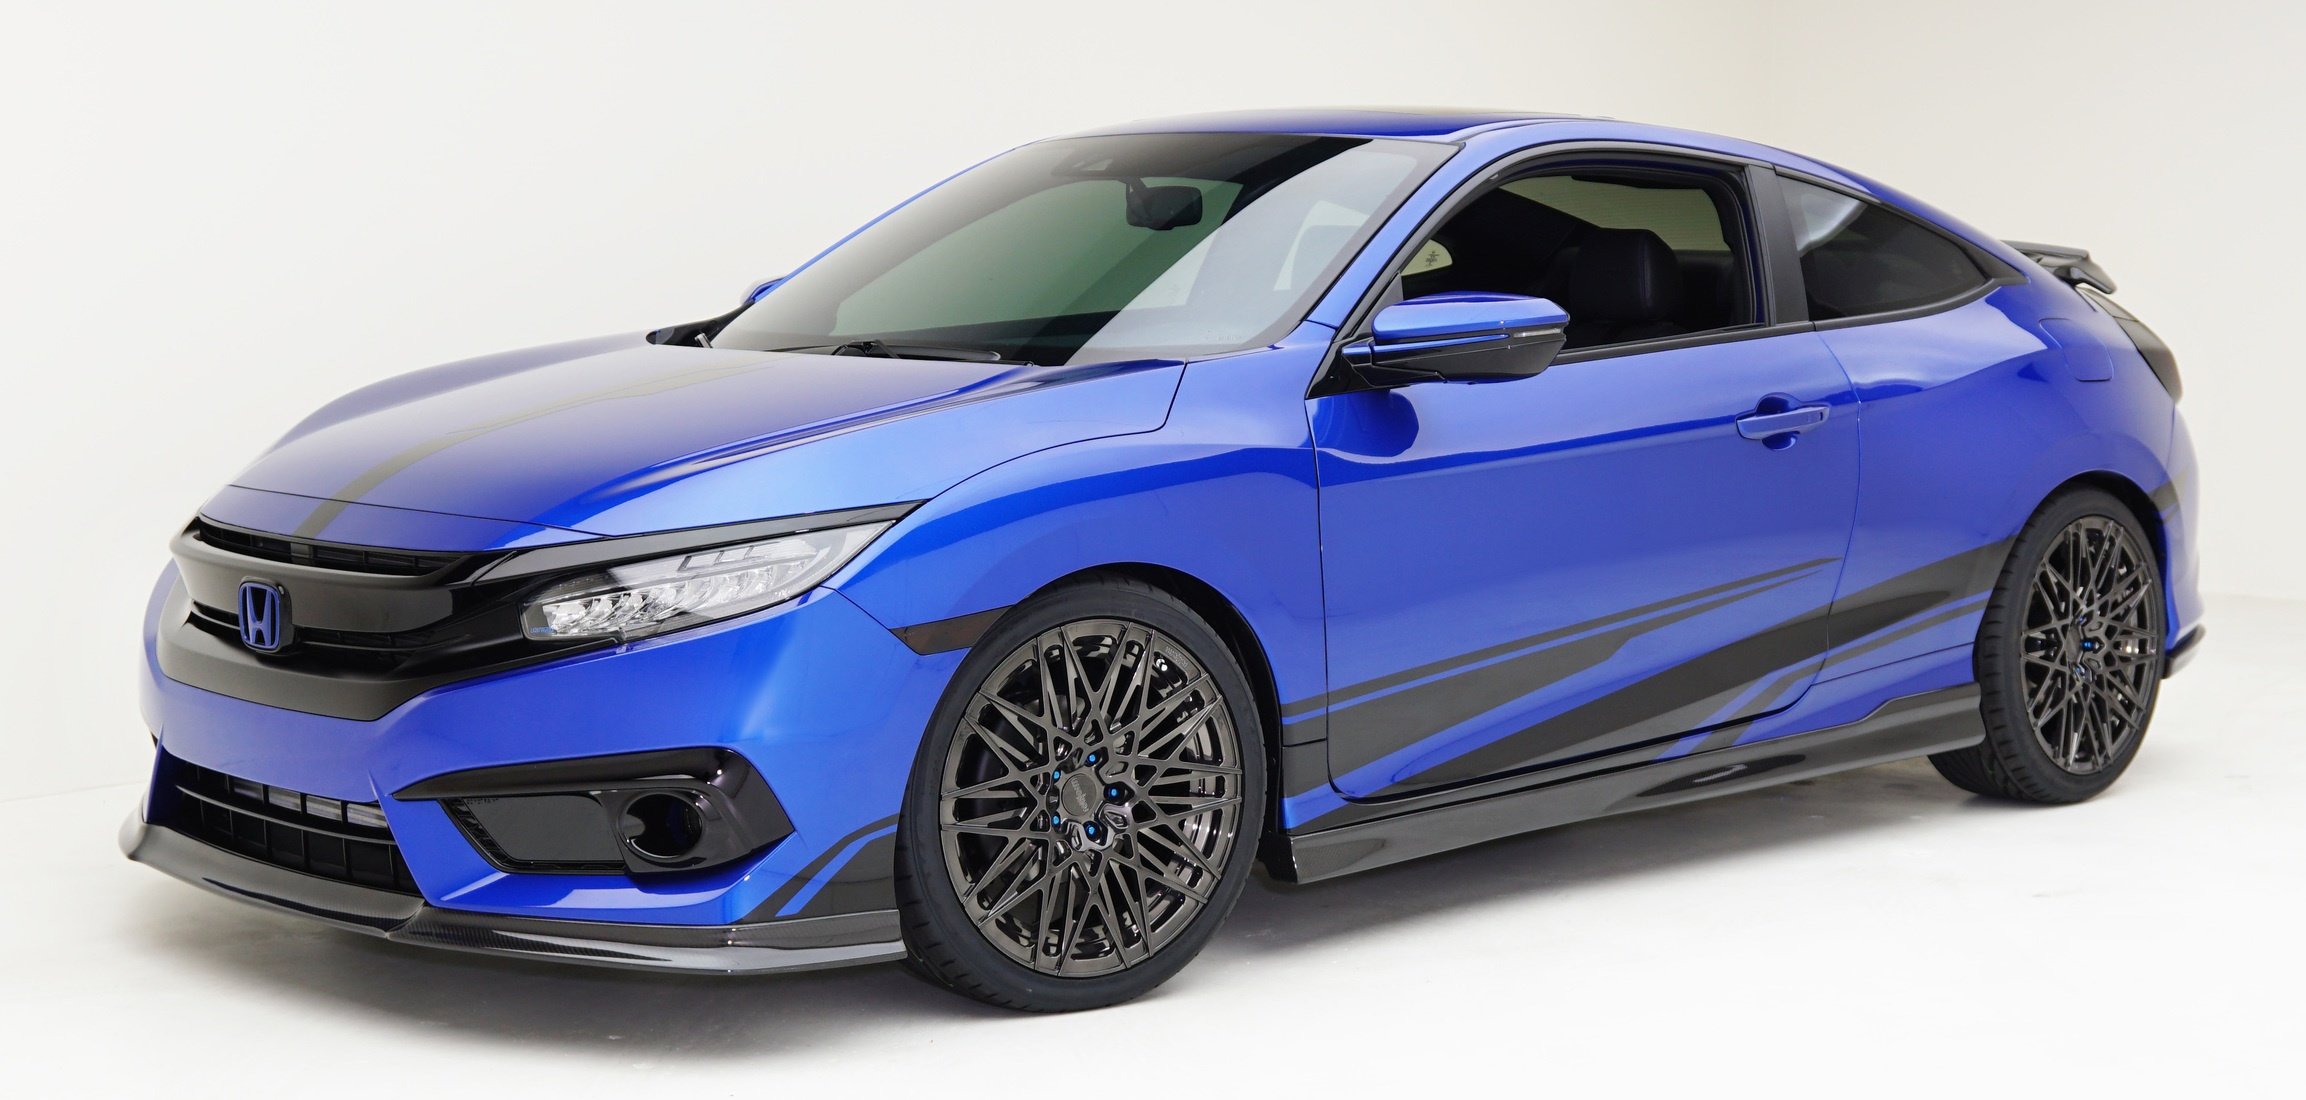 Grc Civic >> Modified Honda Civics showcased at SEMA 2016